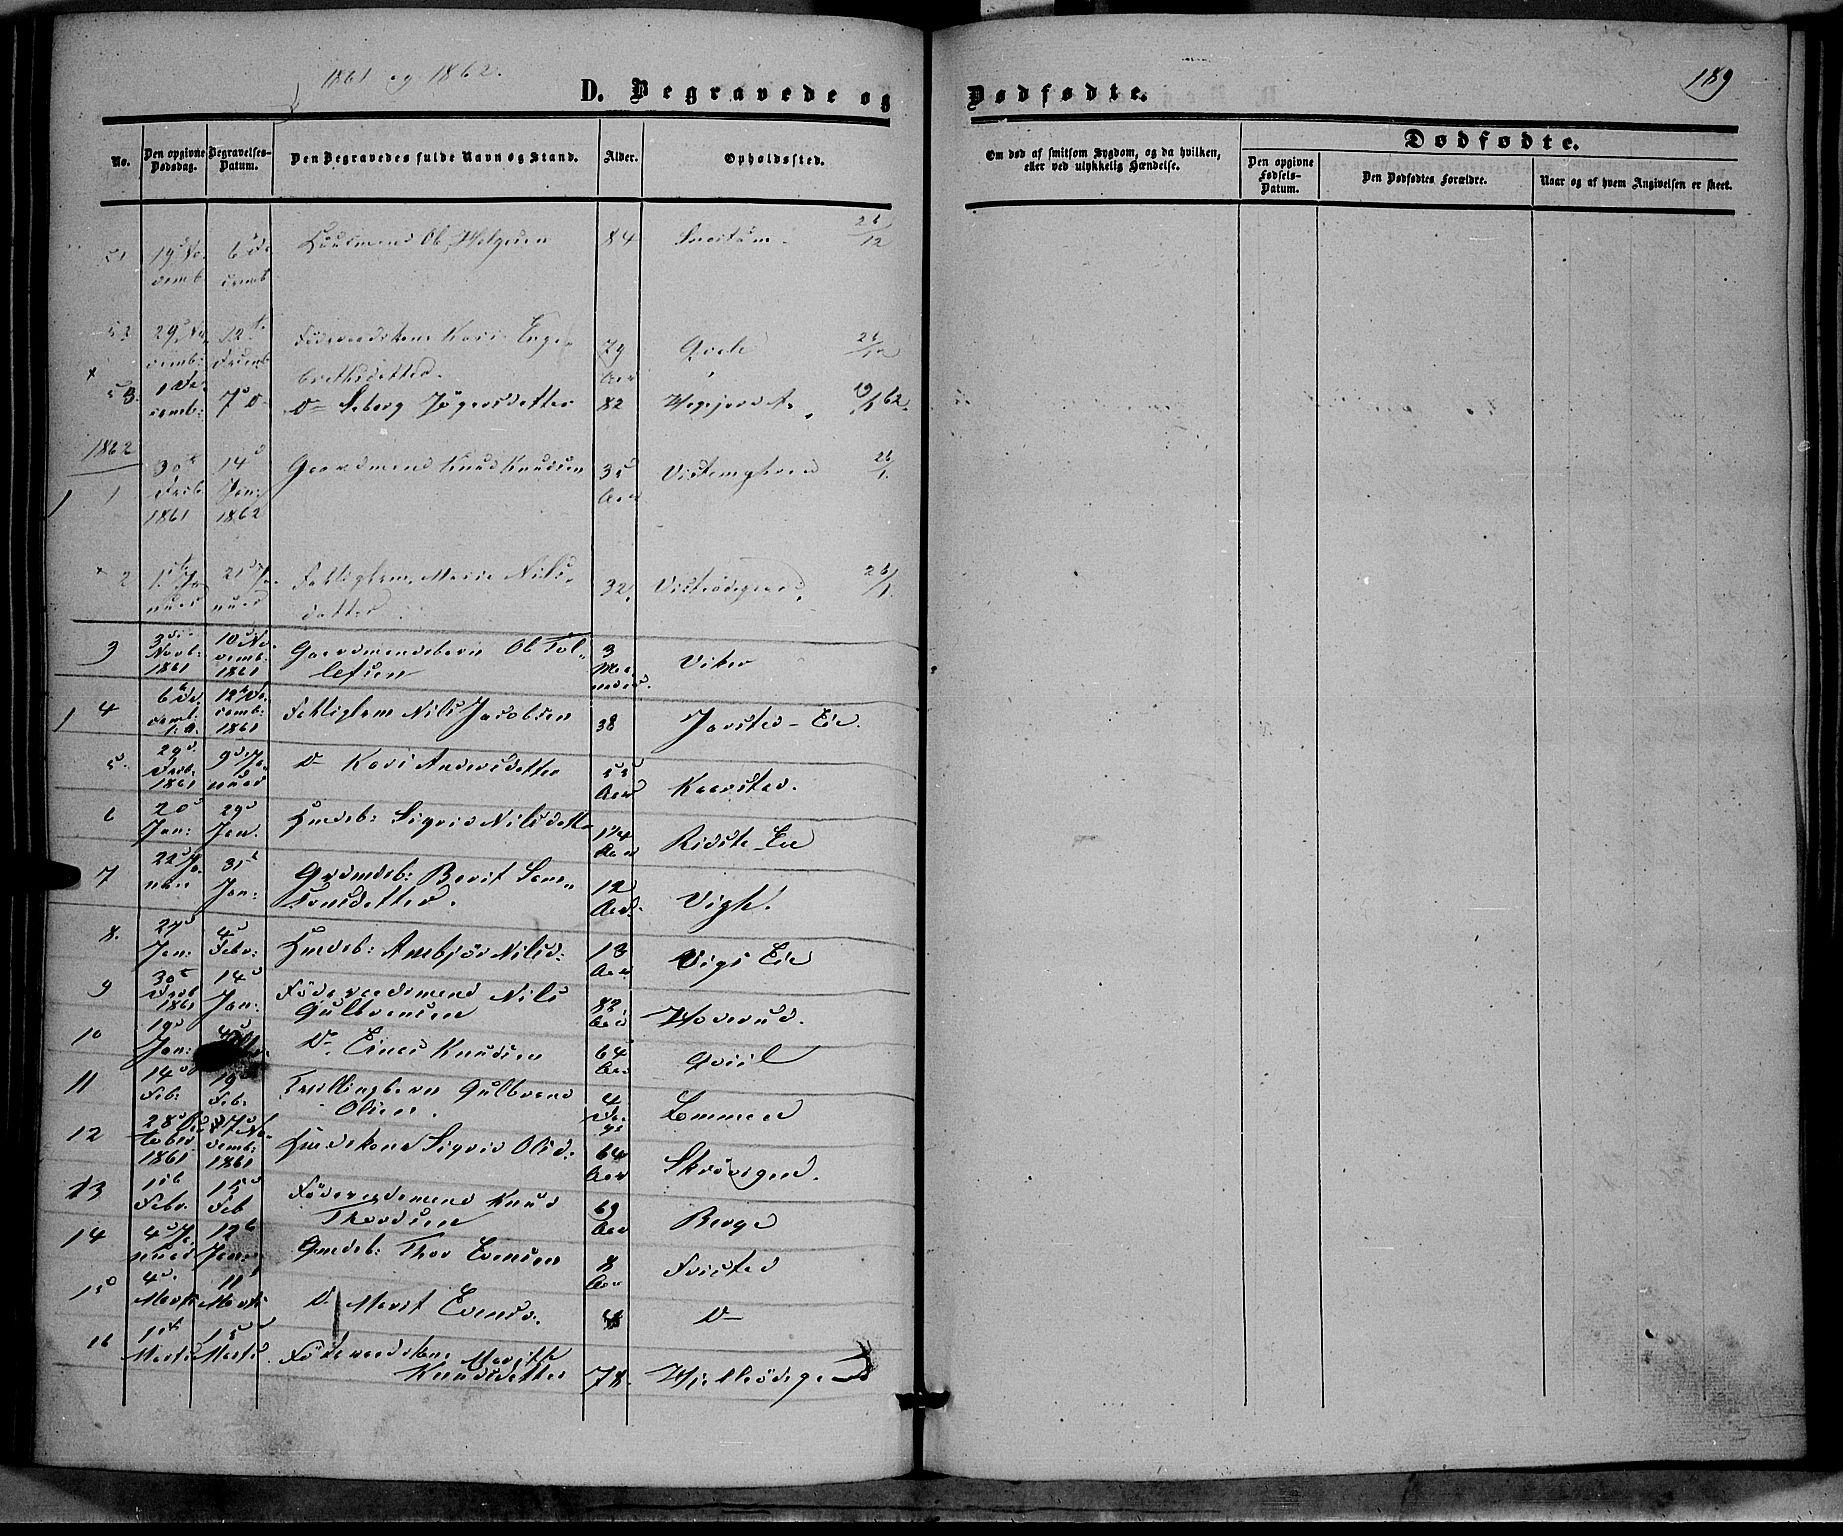 SAH, Vestre Slidre prestekontor, Ministerialbok nr. 2, 1856-1864, s. 189